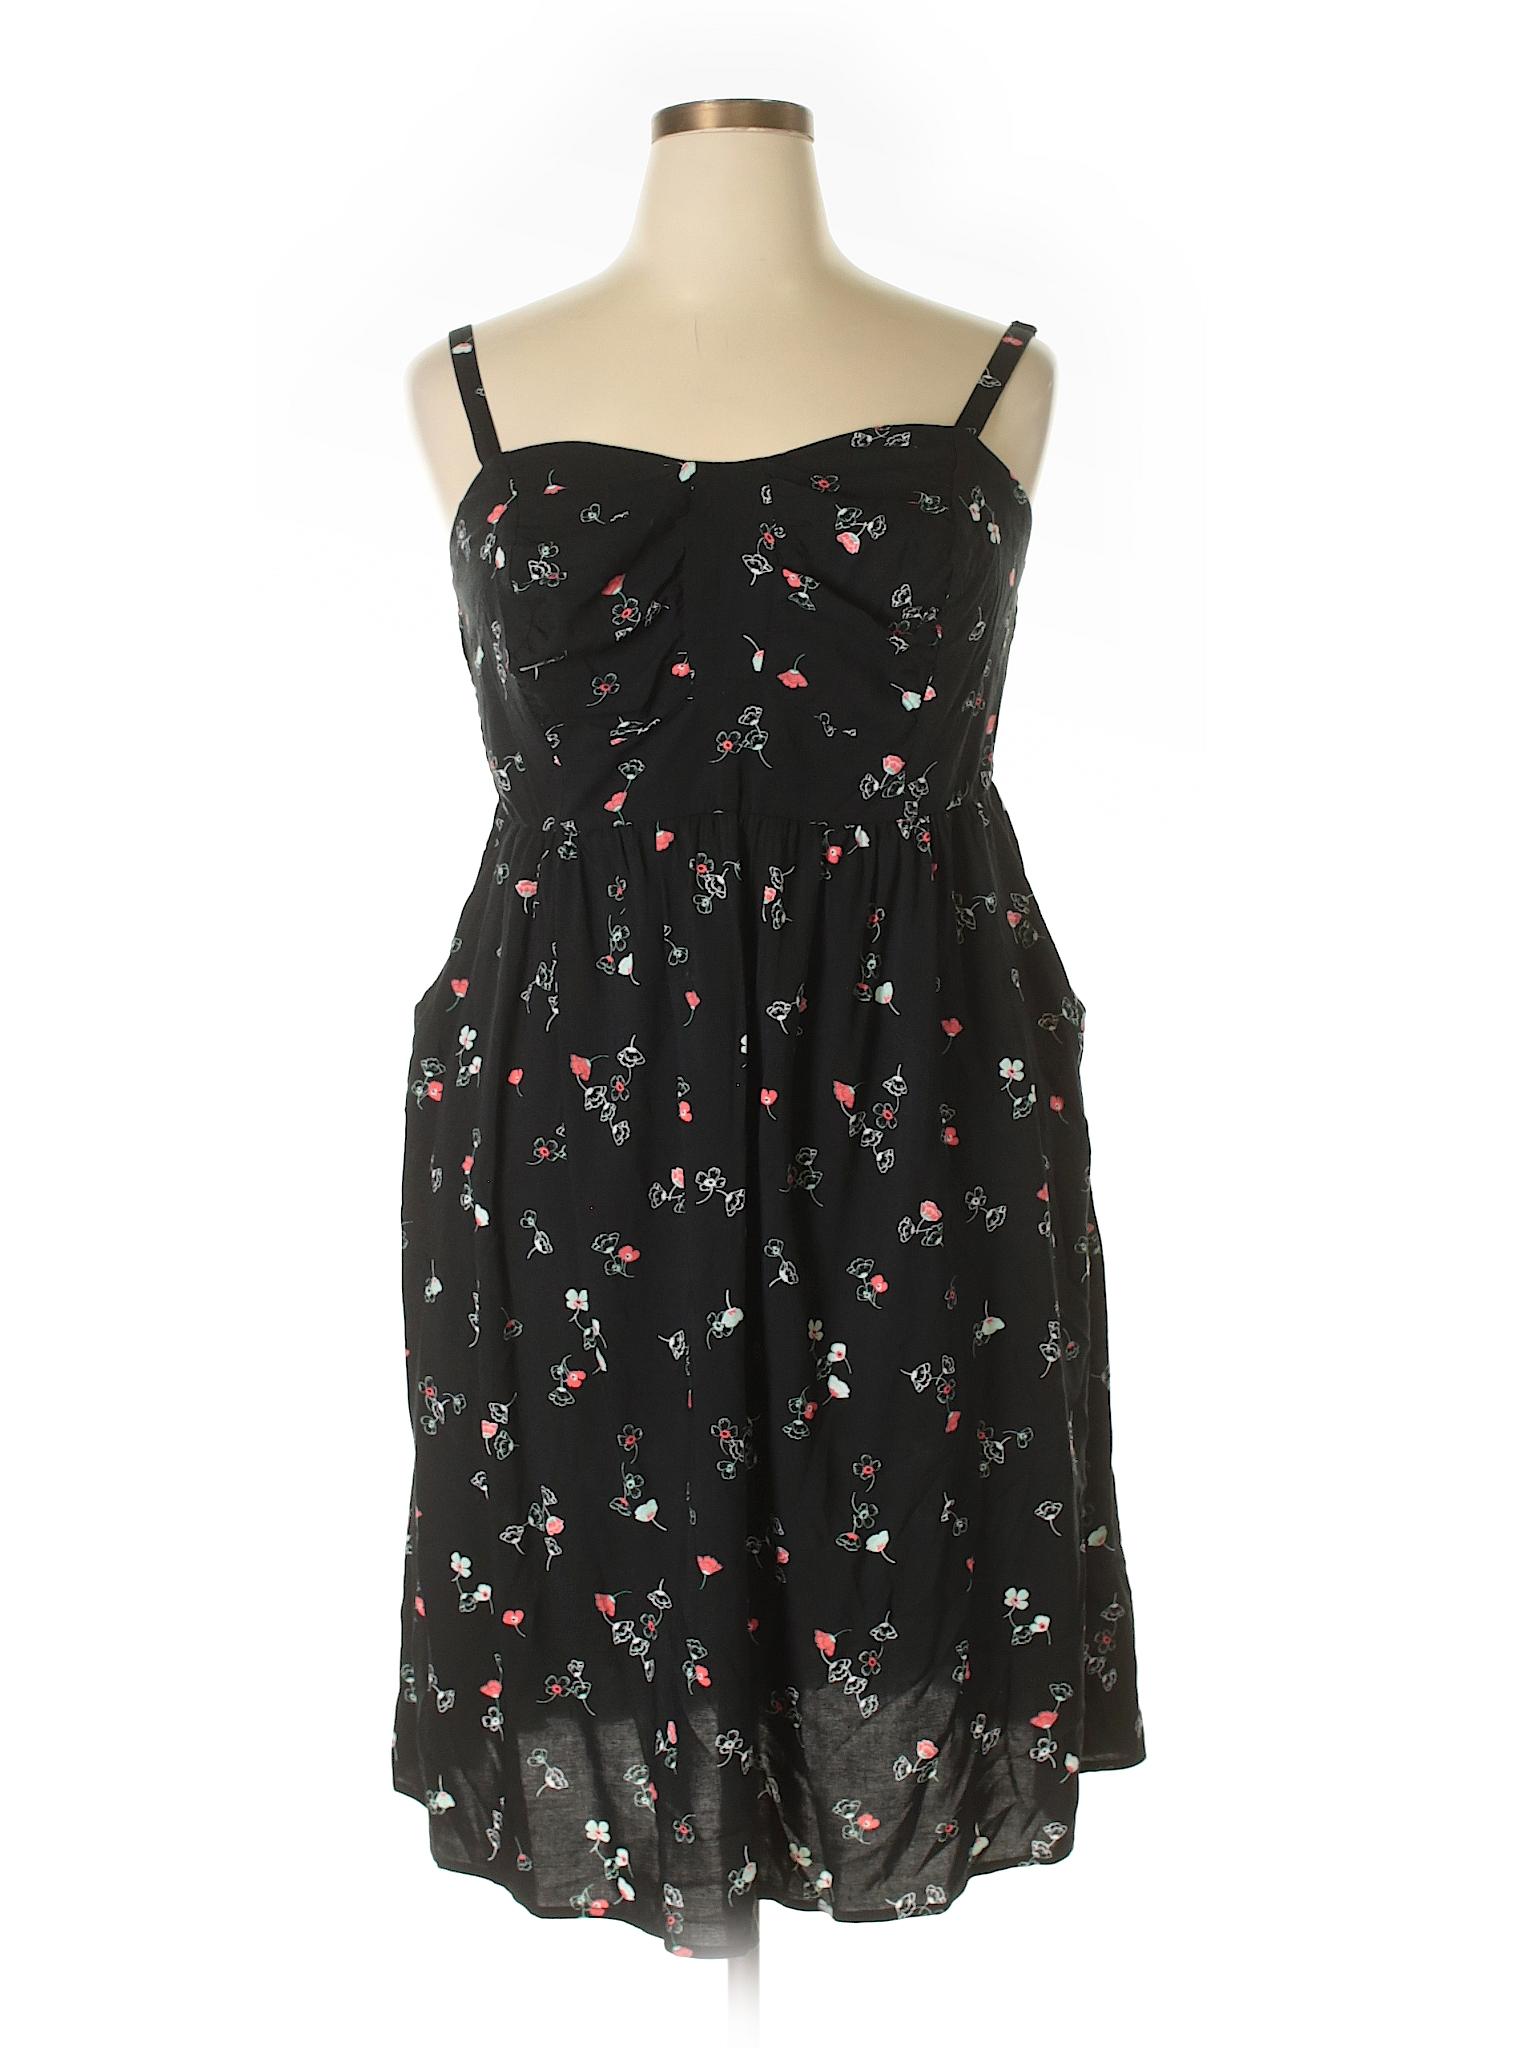 Selling Torrid Casual Selling Torrid Dress ZZTrqx